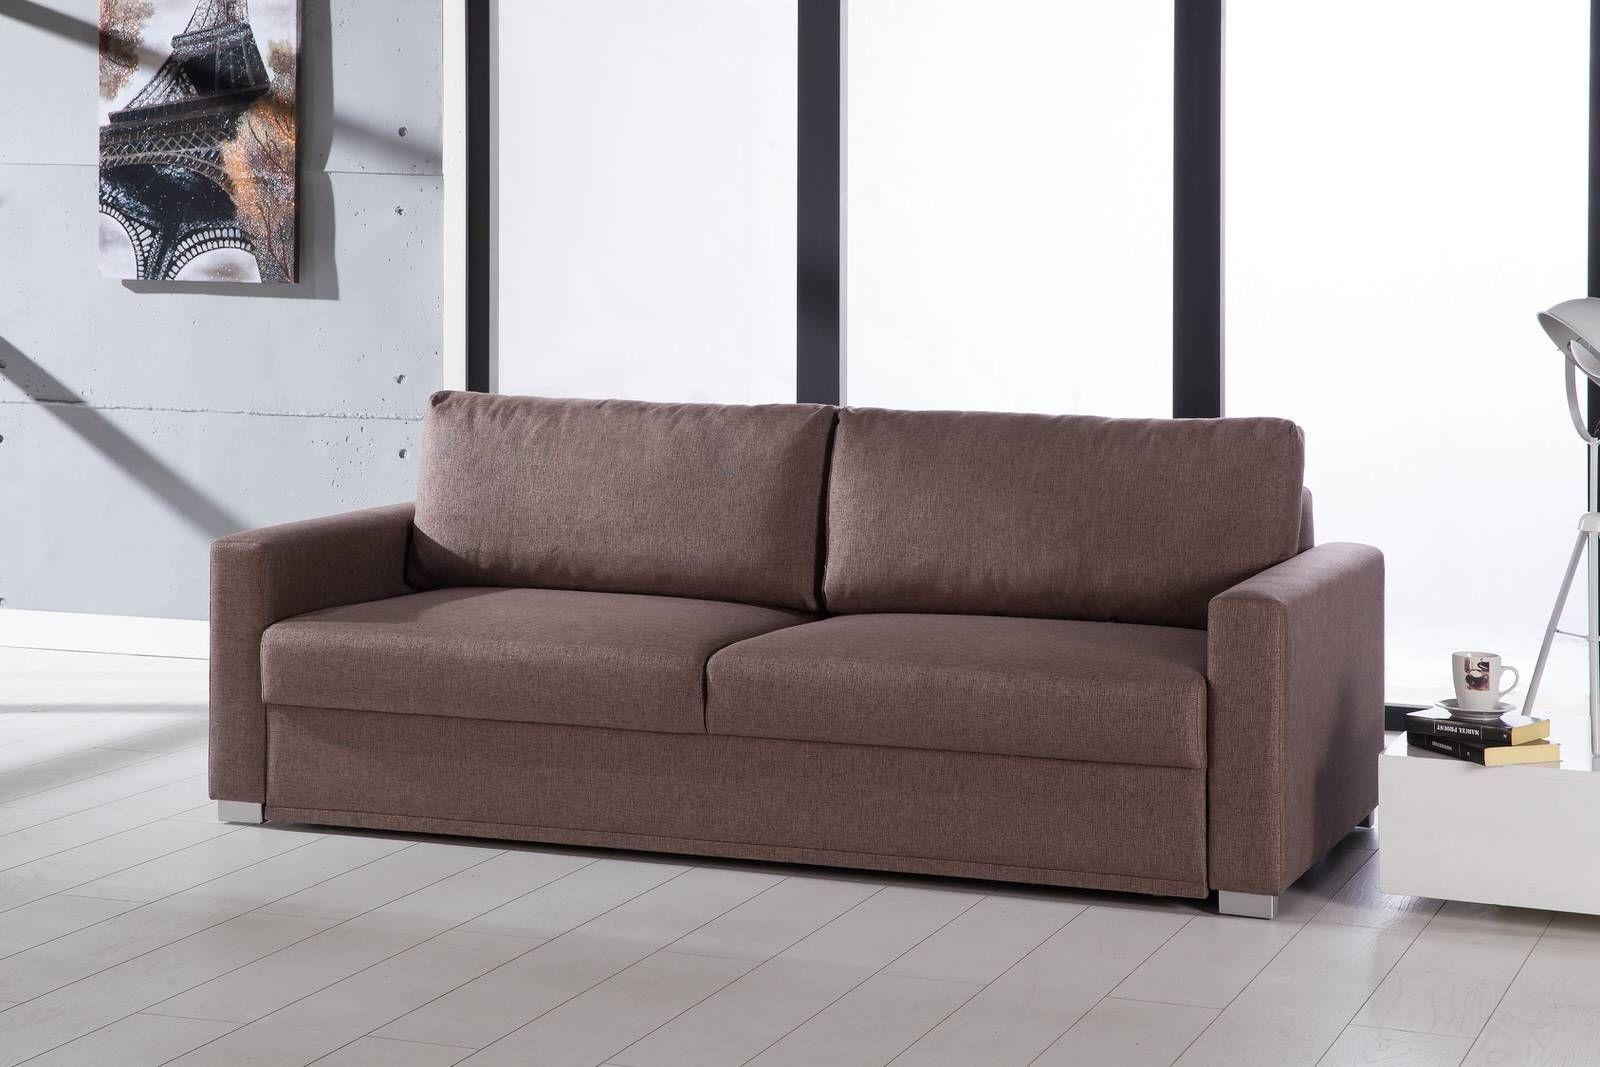 Lovely Living Spaces Sleeper sofa